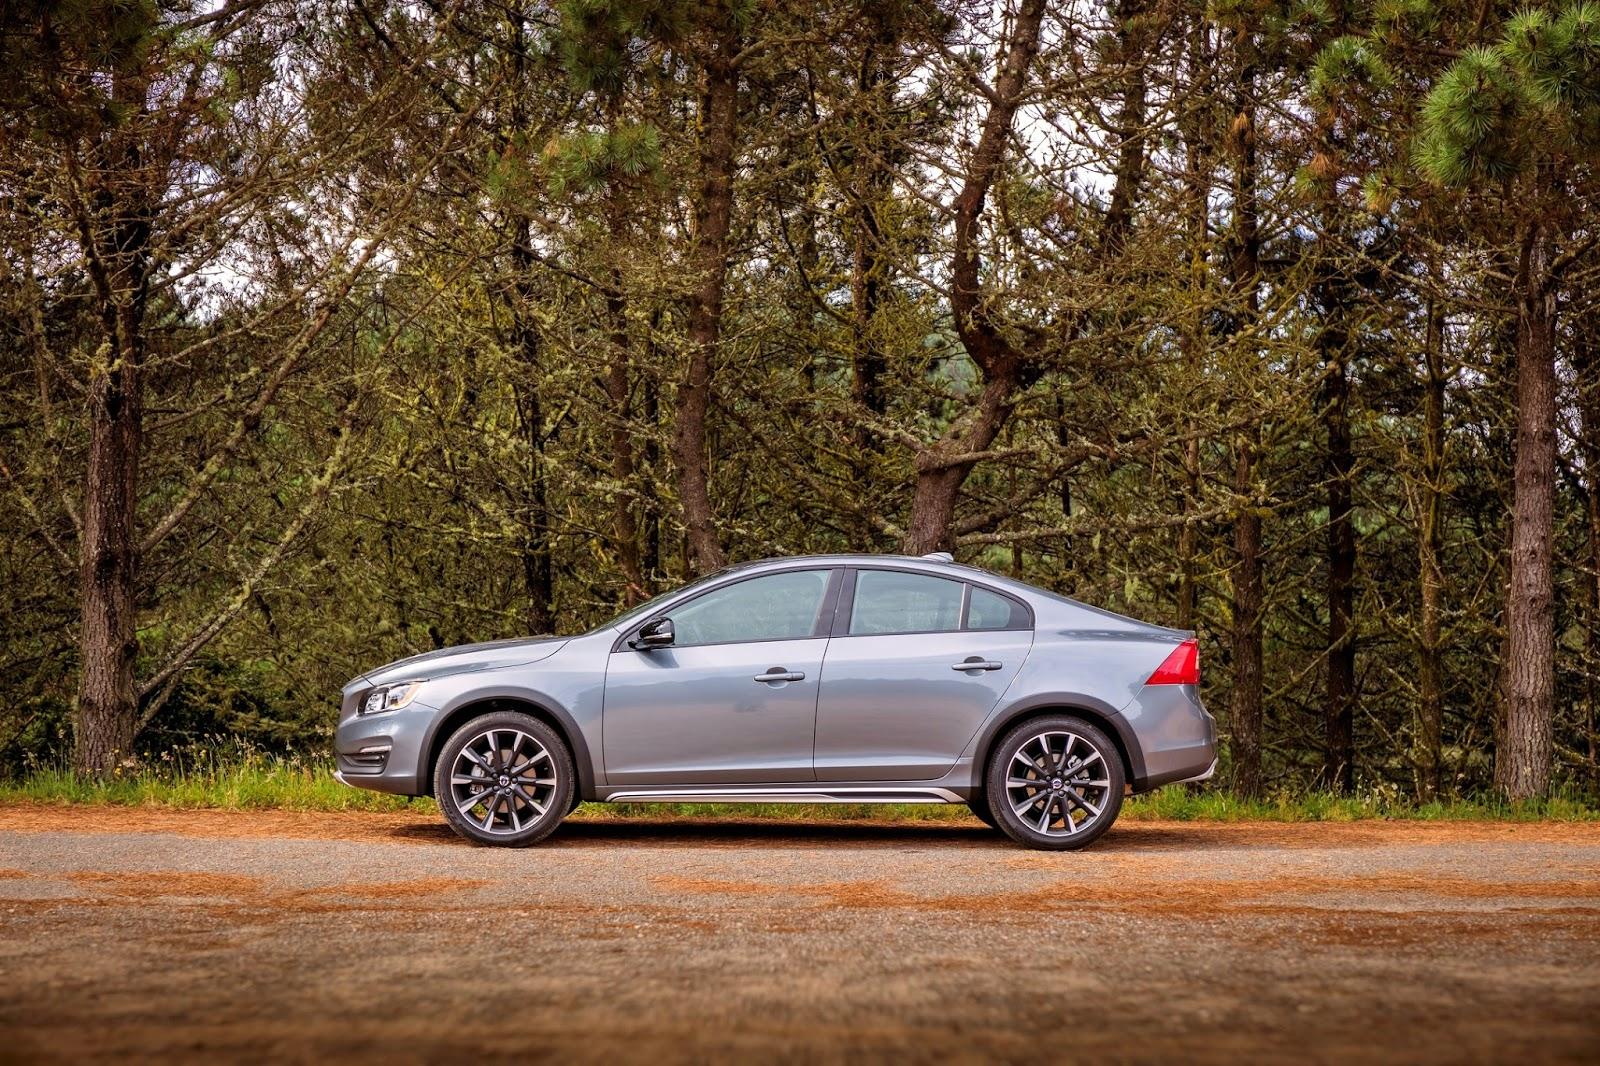 VOLVO%2BS60%2BCROSS%2BCOUNTRY%2B7 Η Volvo με το νέο S60 Cross Country δημιουργεί το πρώτο sedan με διττό χαρακτήρα